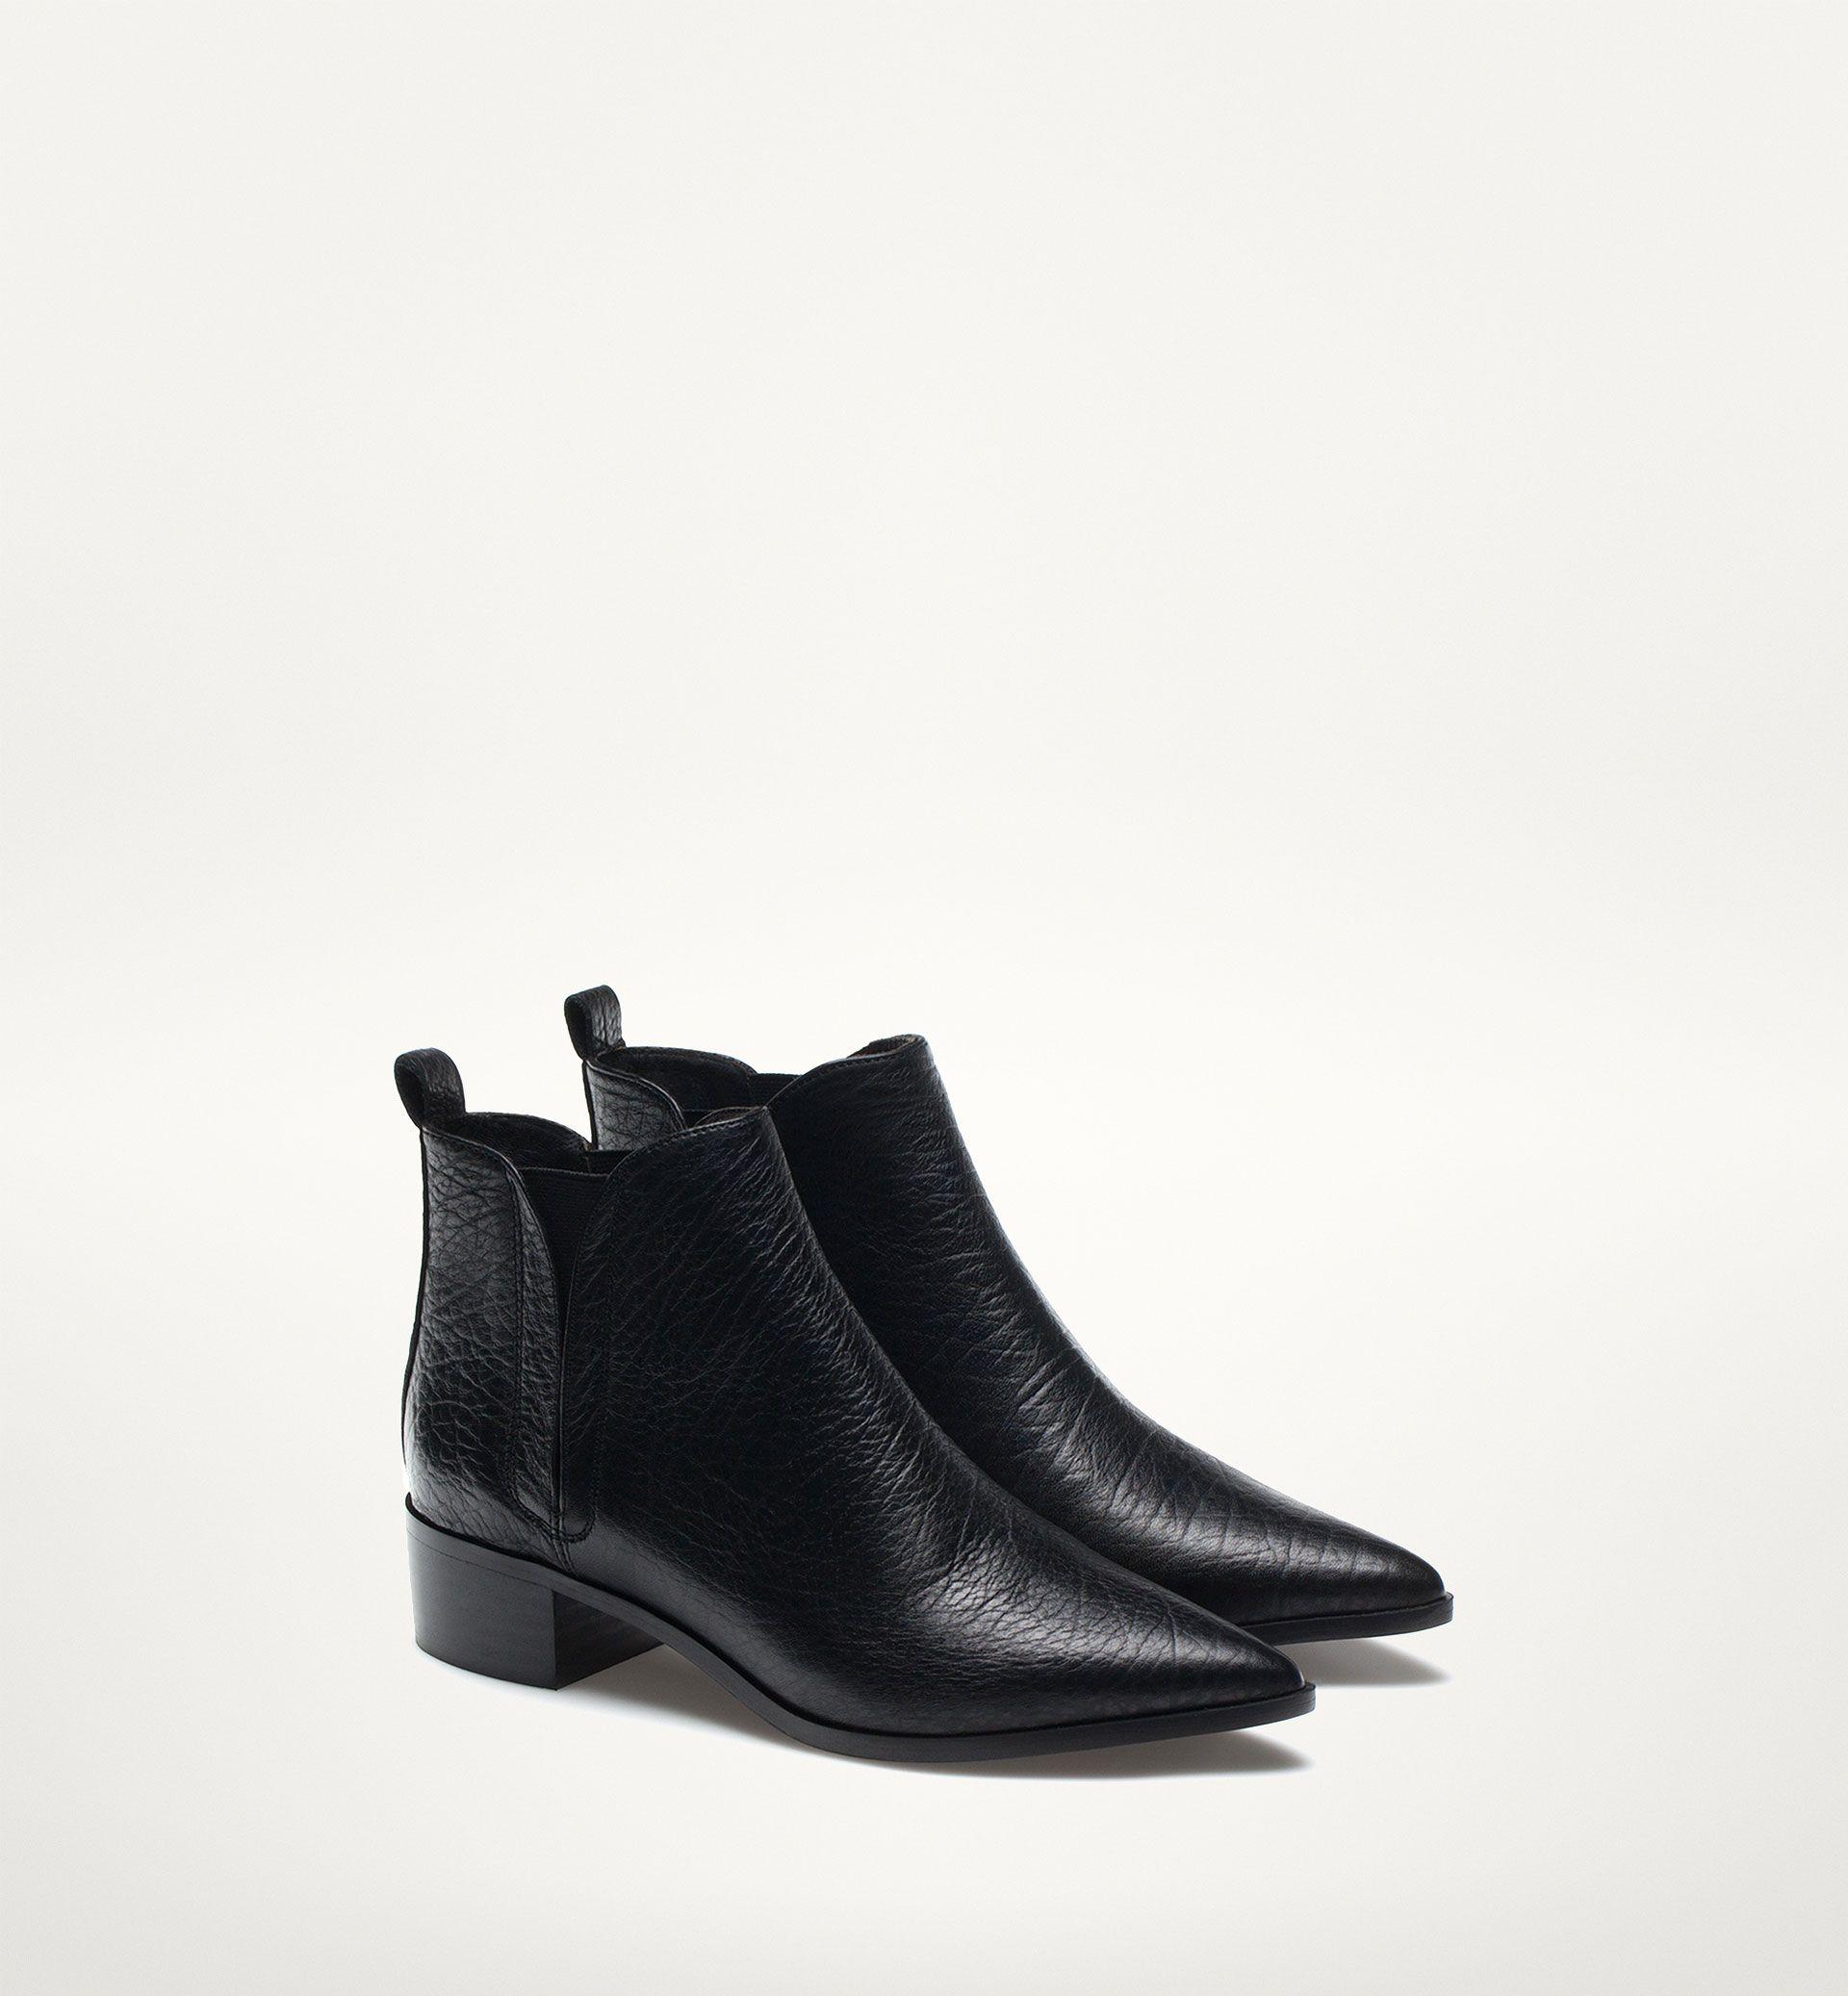 Assez BOTTINE BOUT NOIR | Mode | Pinterest | Bottines, Noir et Chaussure OJ19